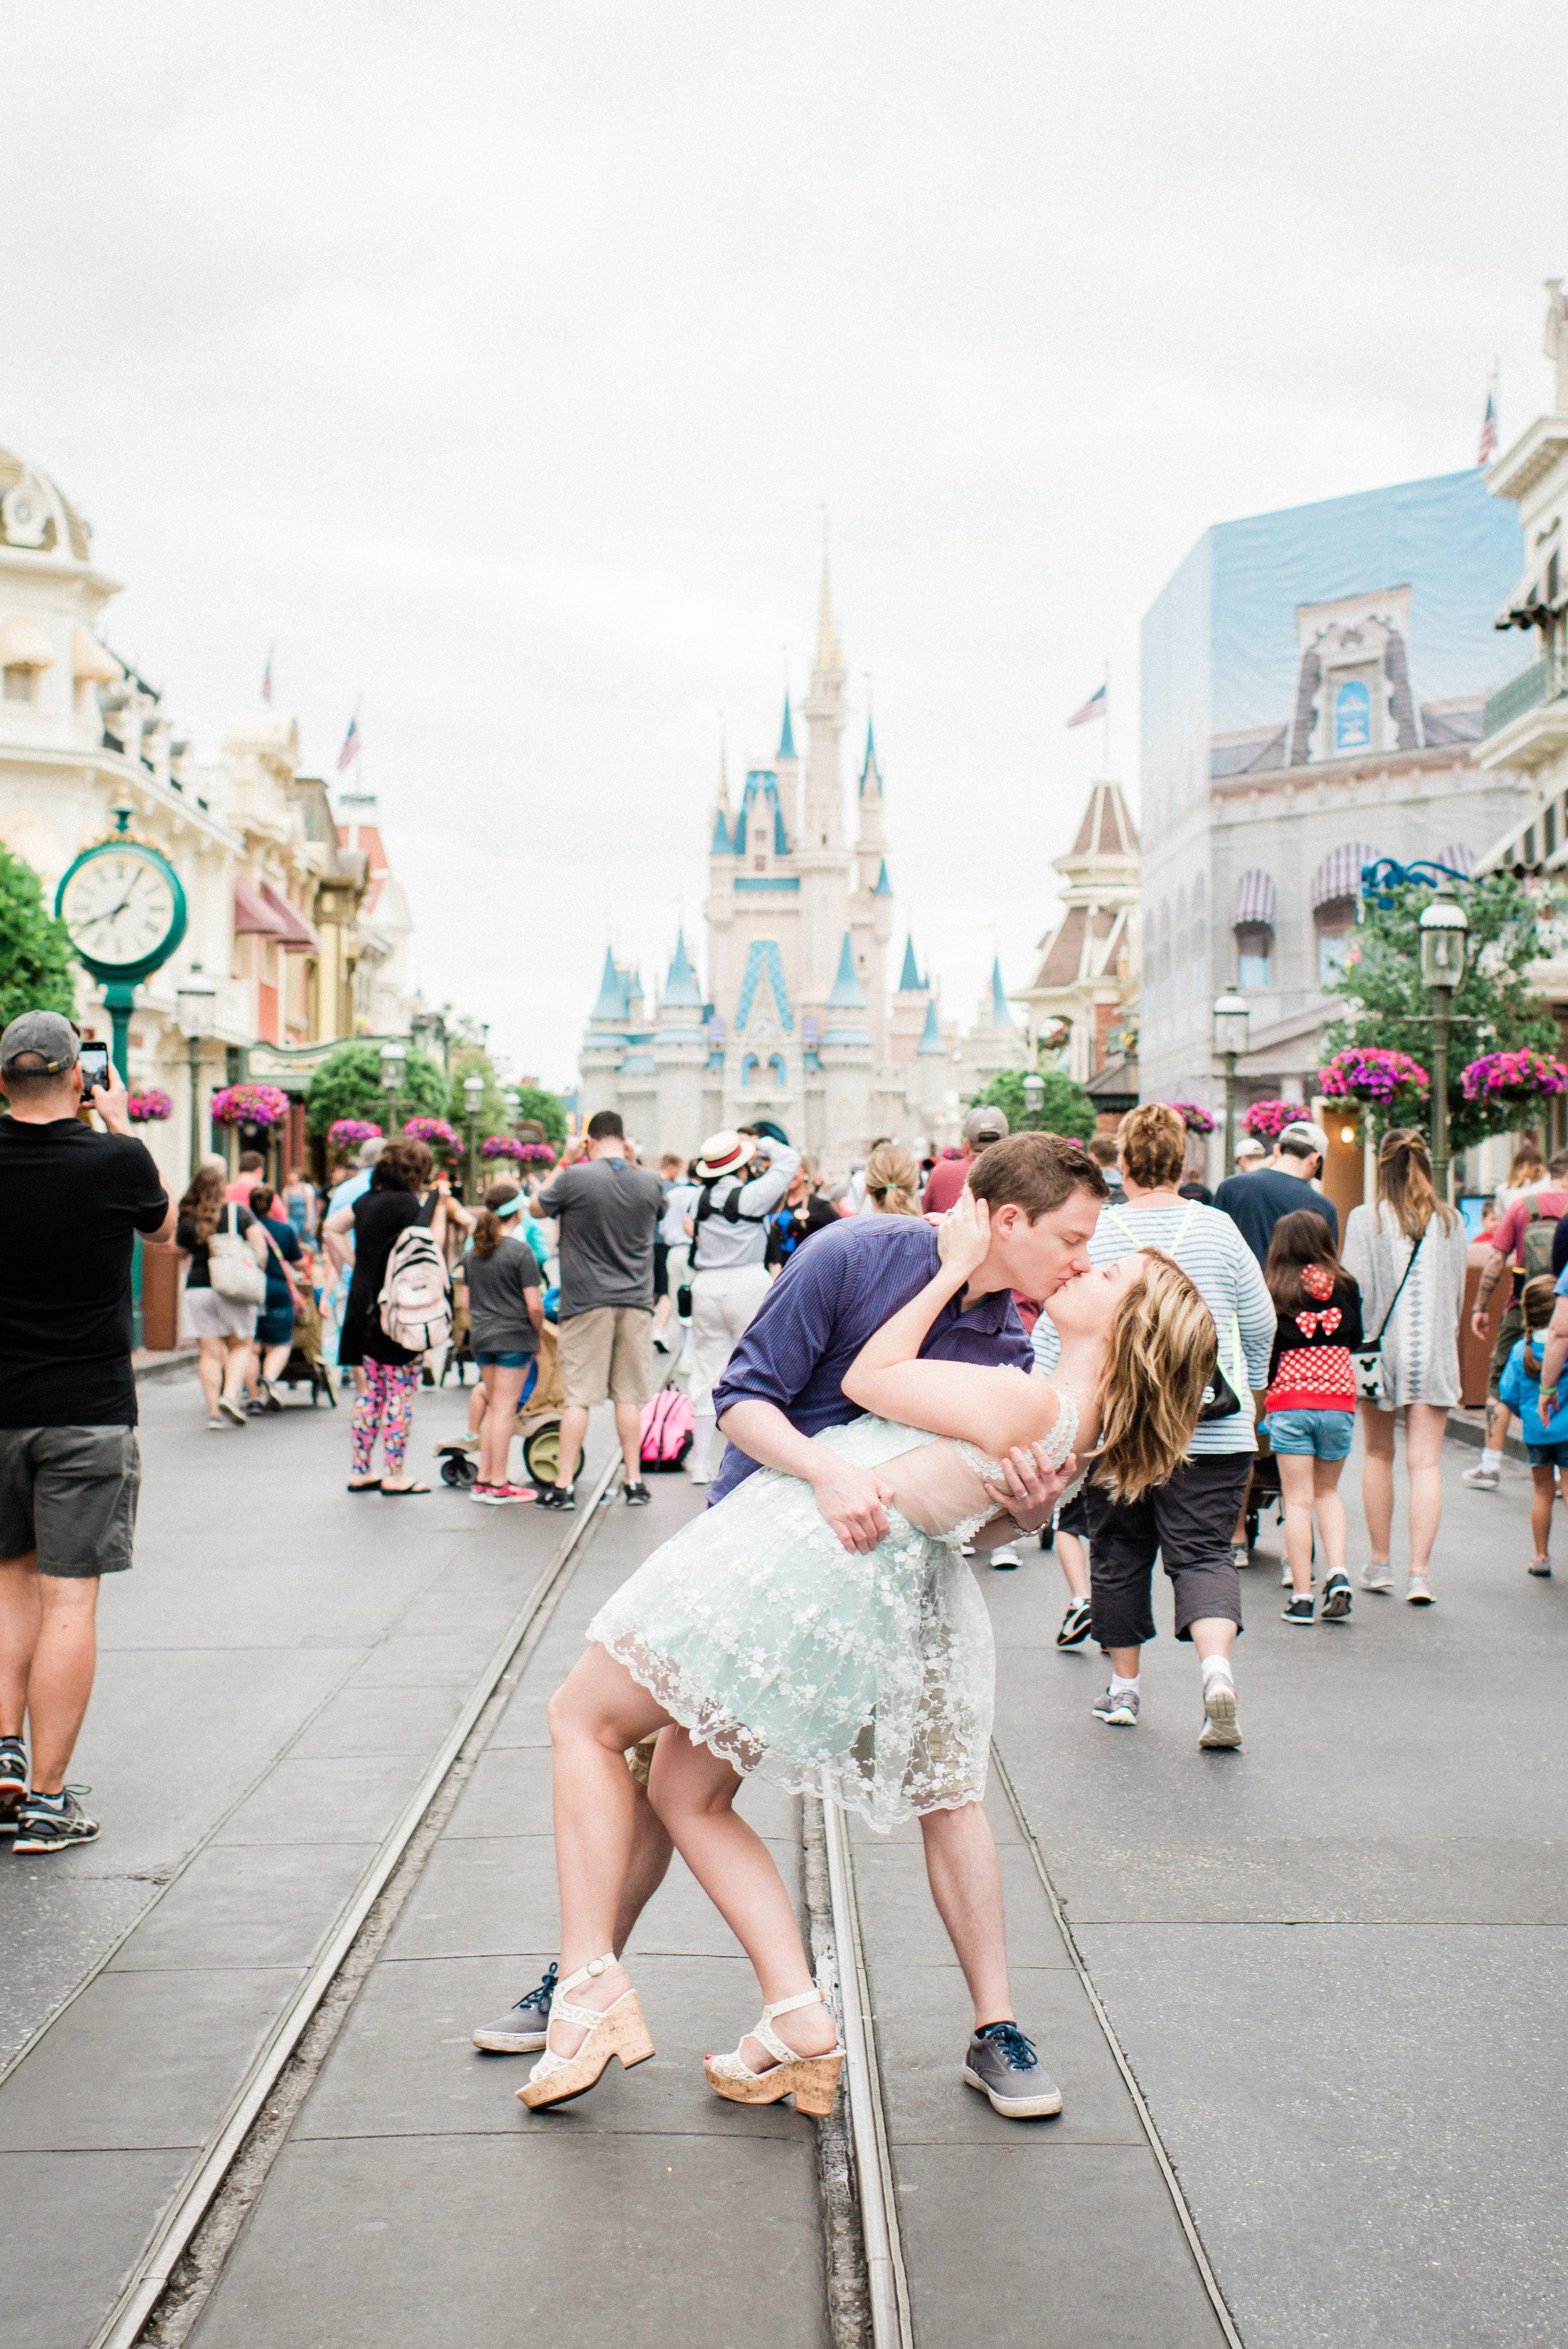 KateTaramykinStudios-Disney-World-Magic-Kingdom-Portraits-KristenDylan-5.jpg